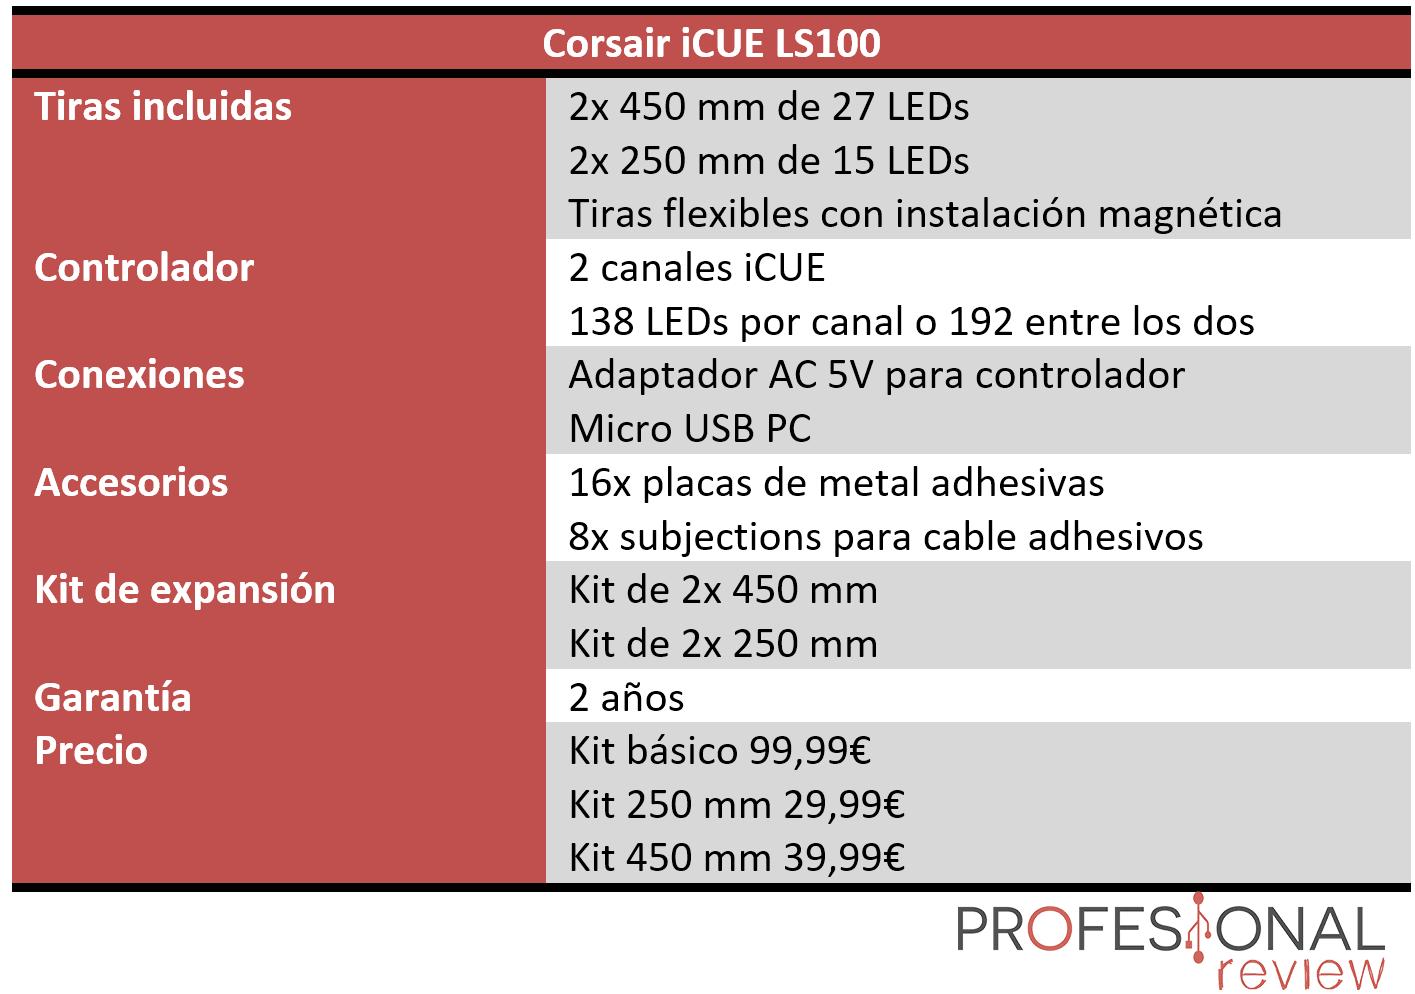 Corsair iCUE LS100 características